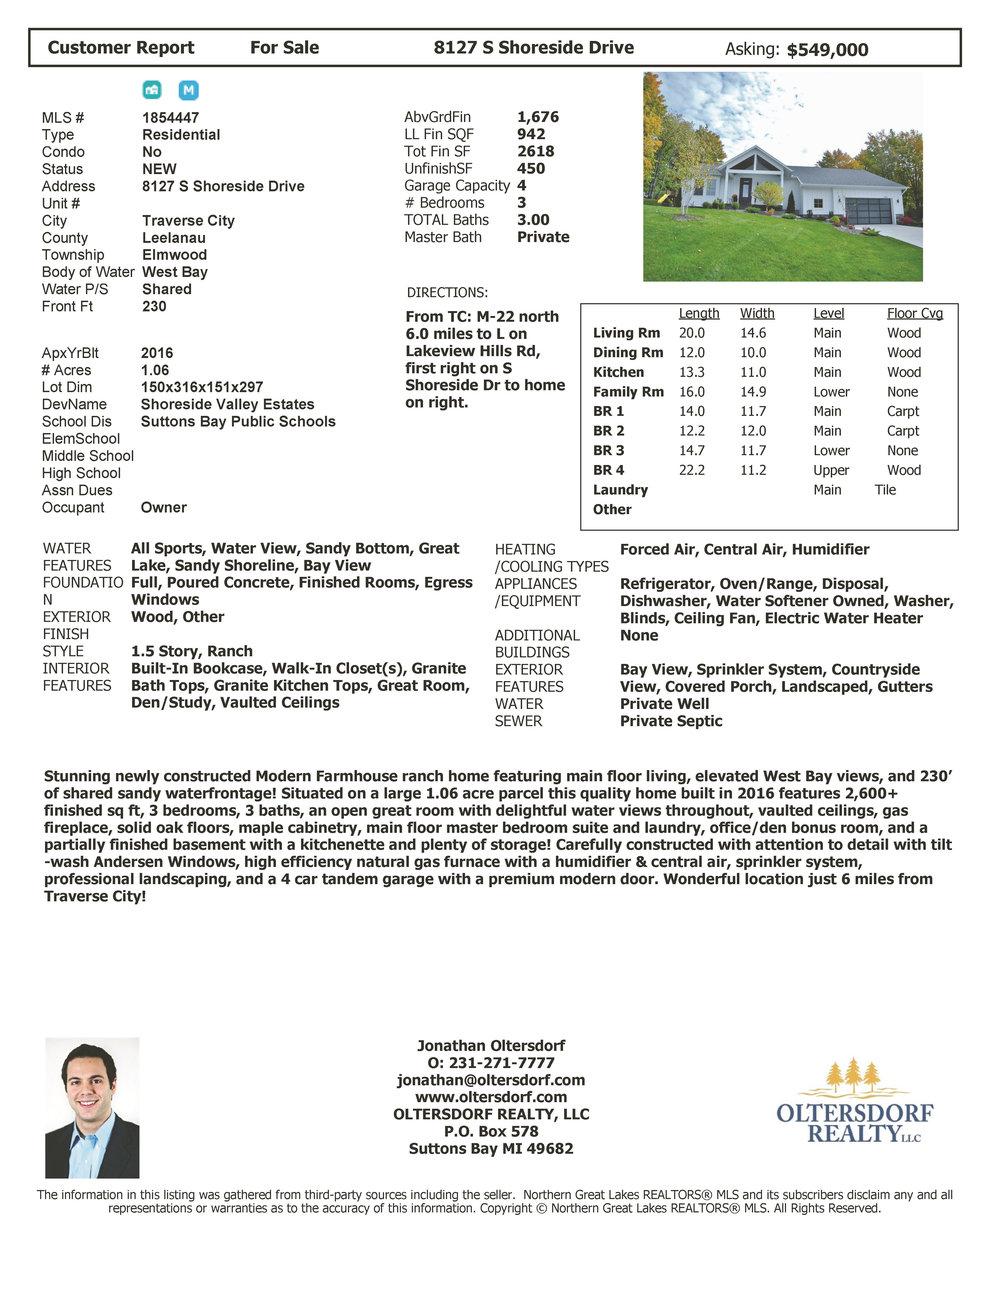 8127 S Shoreside Drive, Traverse City – Marketing packet by Oltersdorf Realty LLC (10).jpg